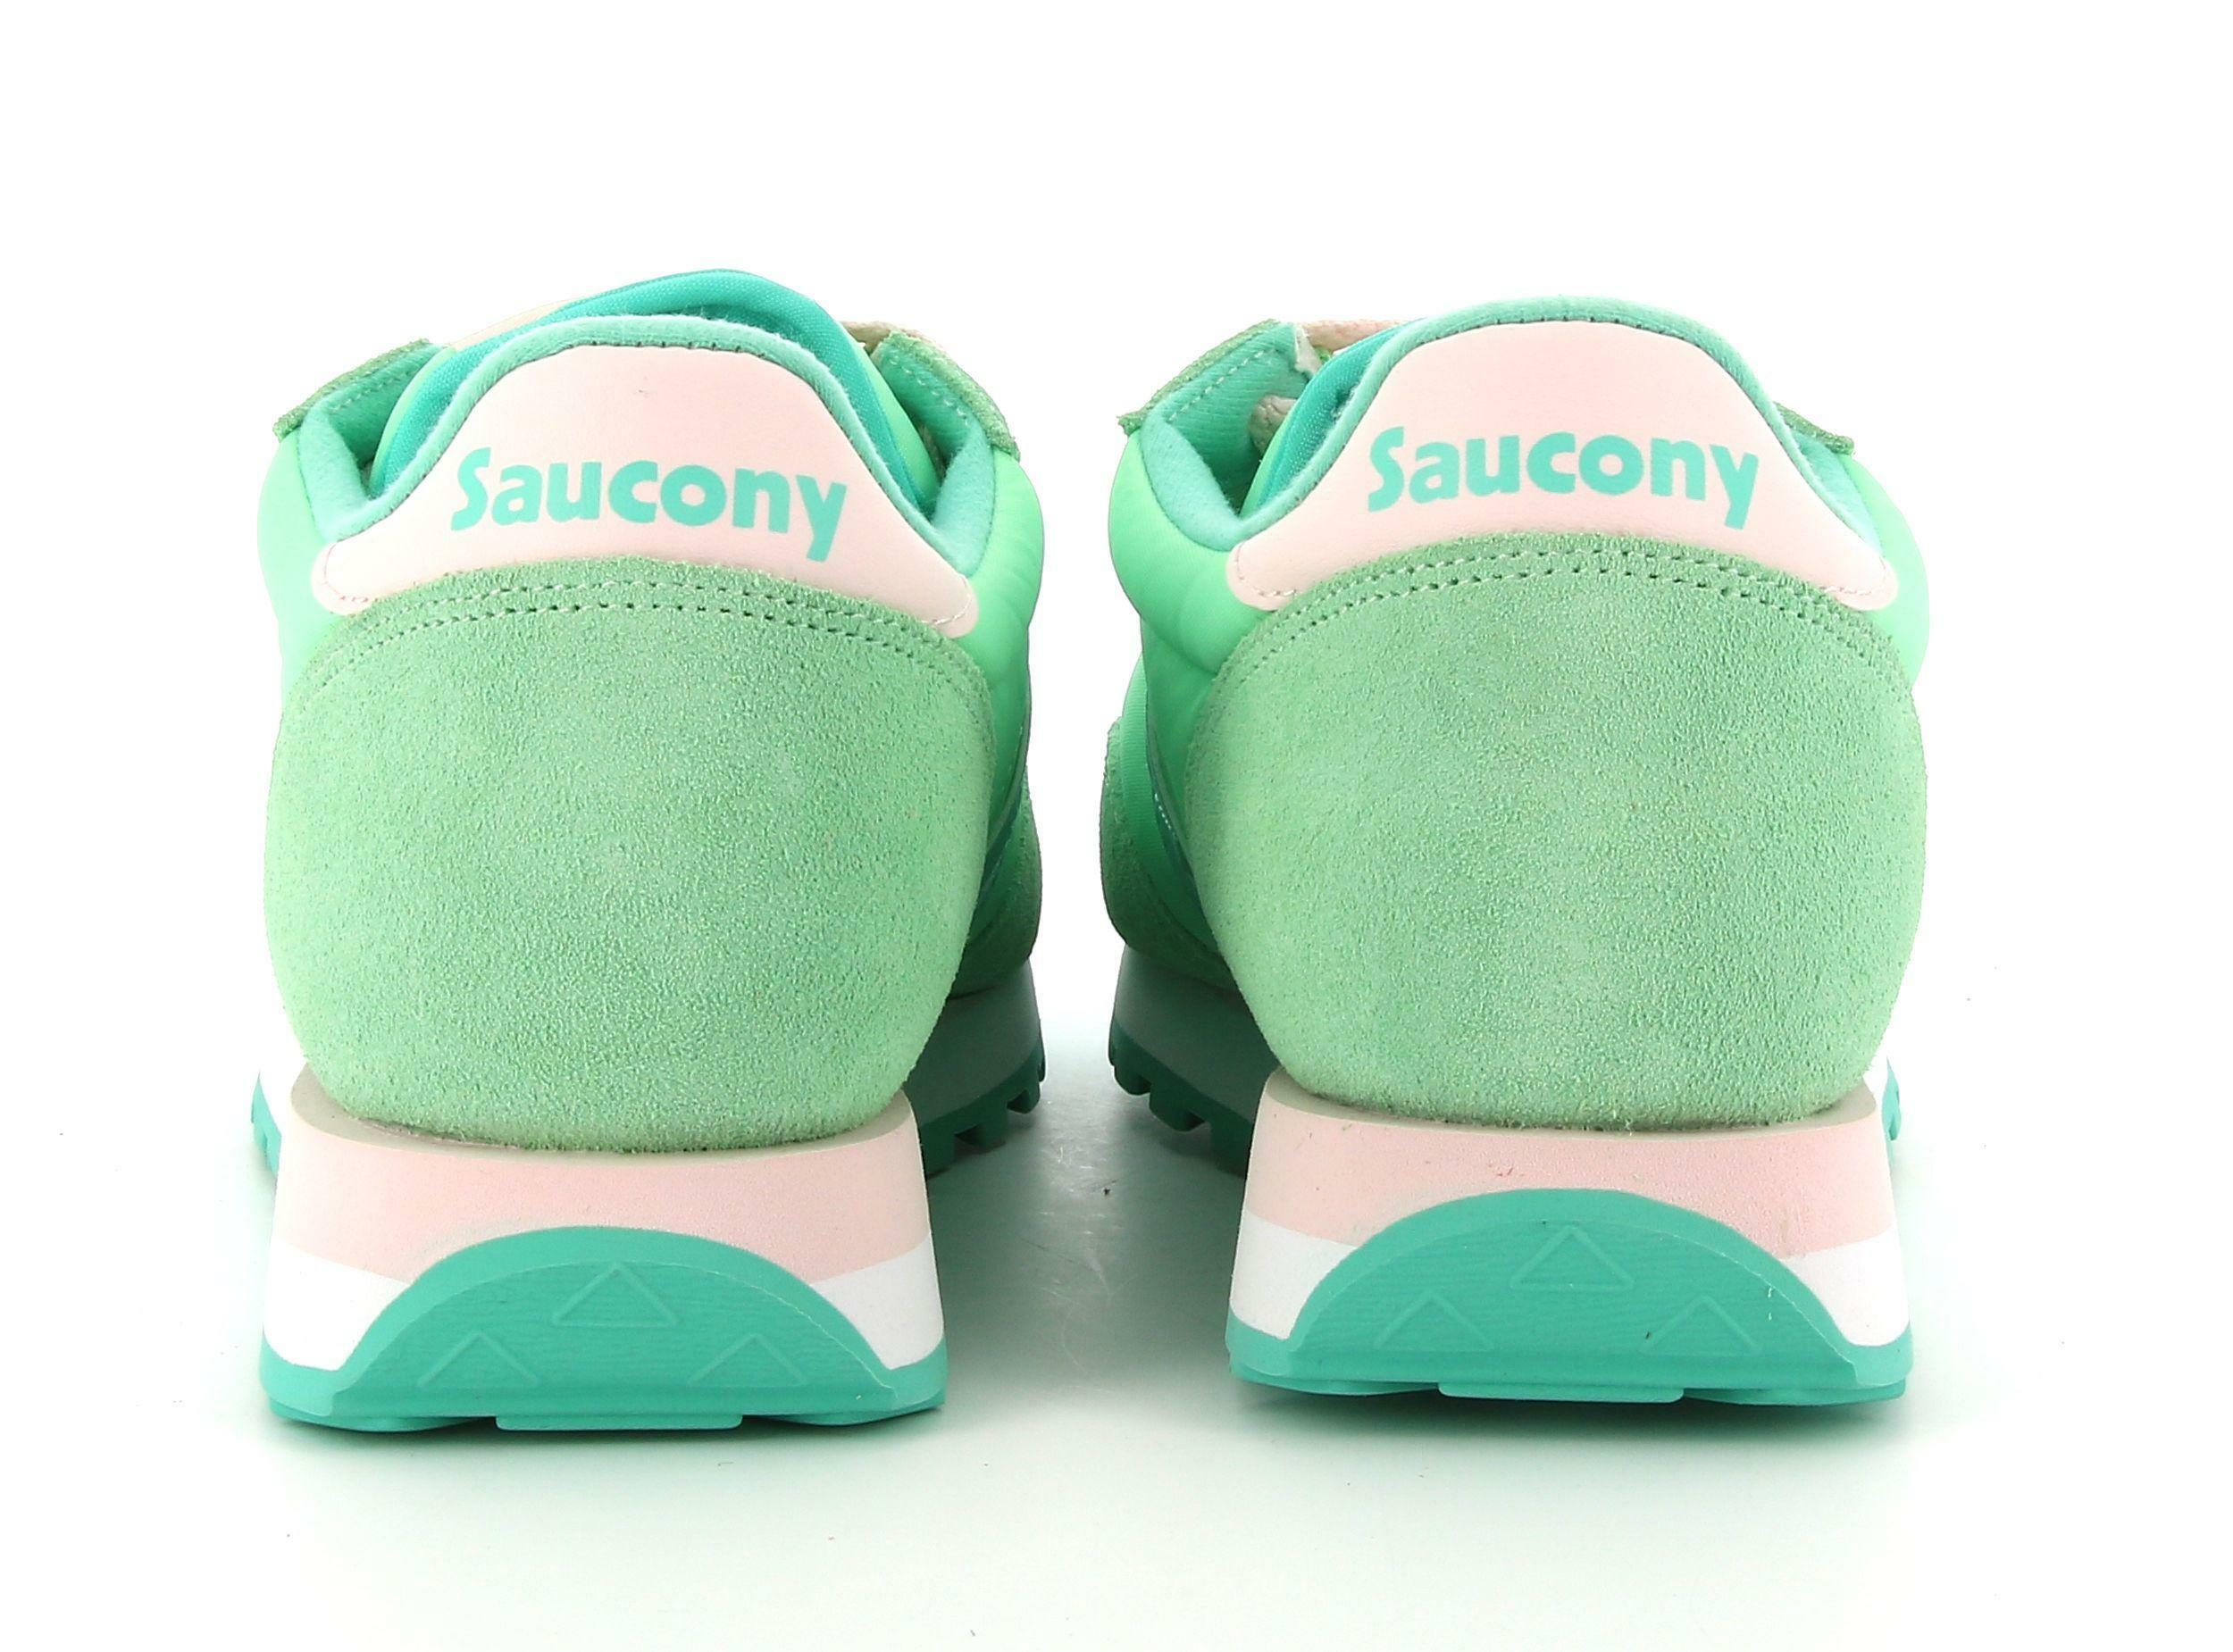 saucony saucony scarpe jazz original codice s1044-609 mint/green donna